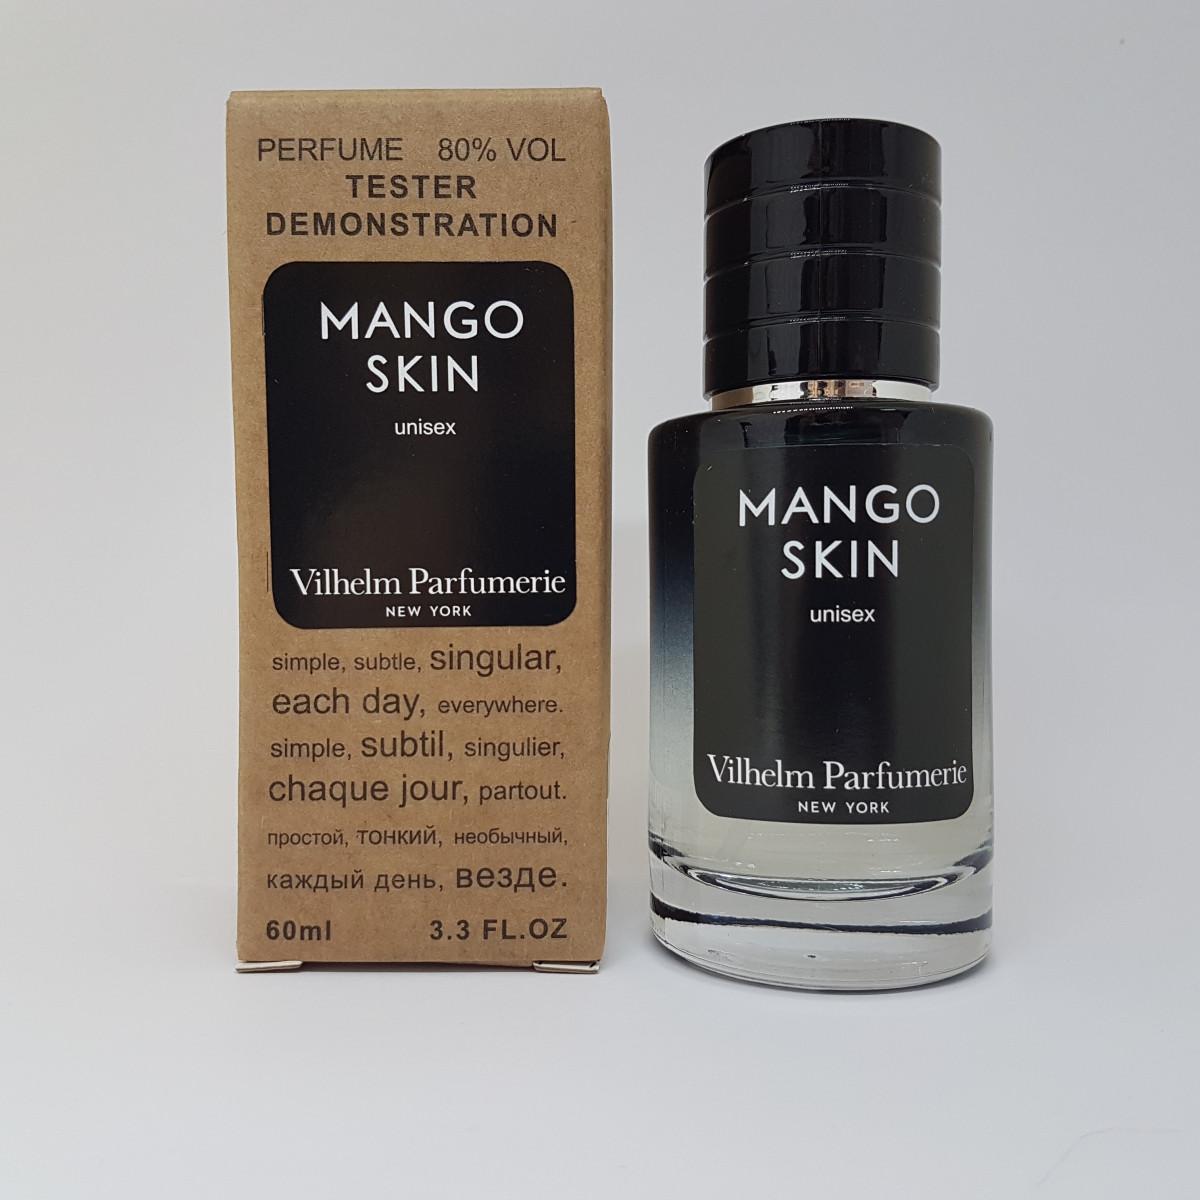 Vilhelm Parfumerie Mango Skin - Selective Tester 60ml